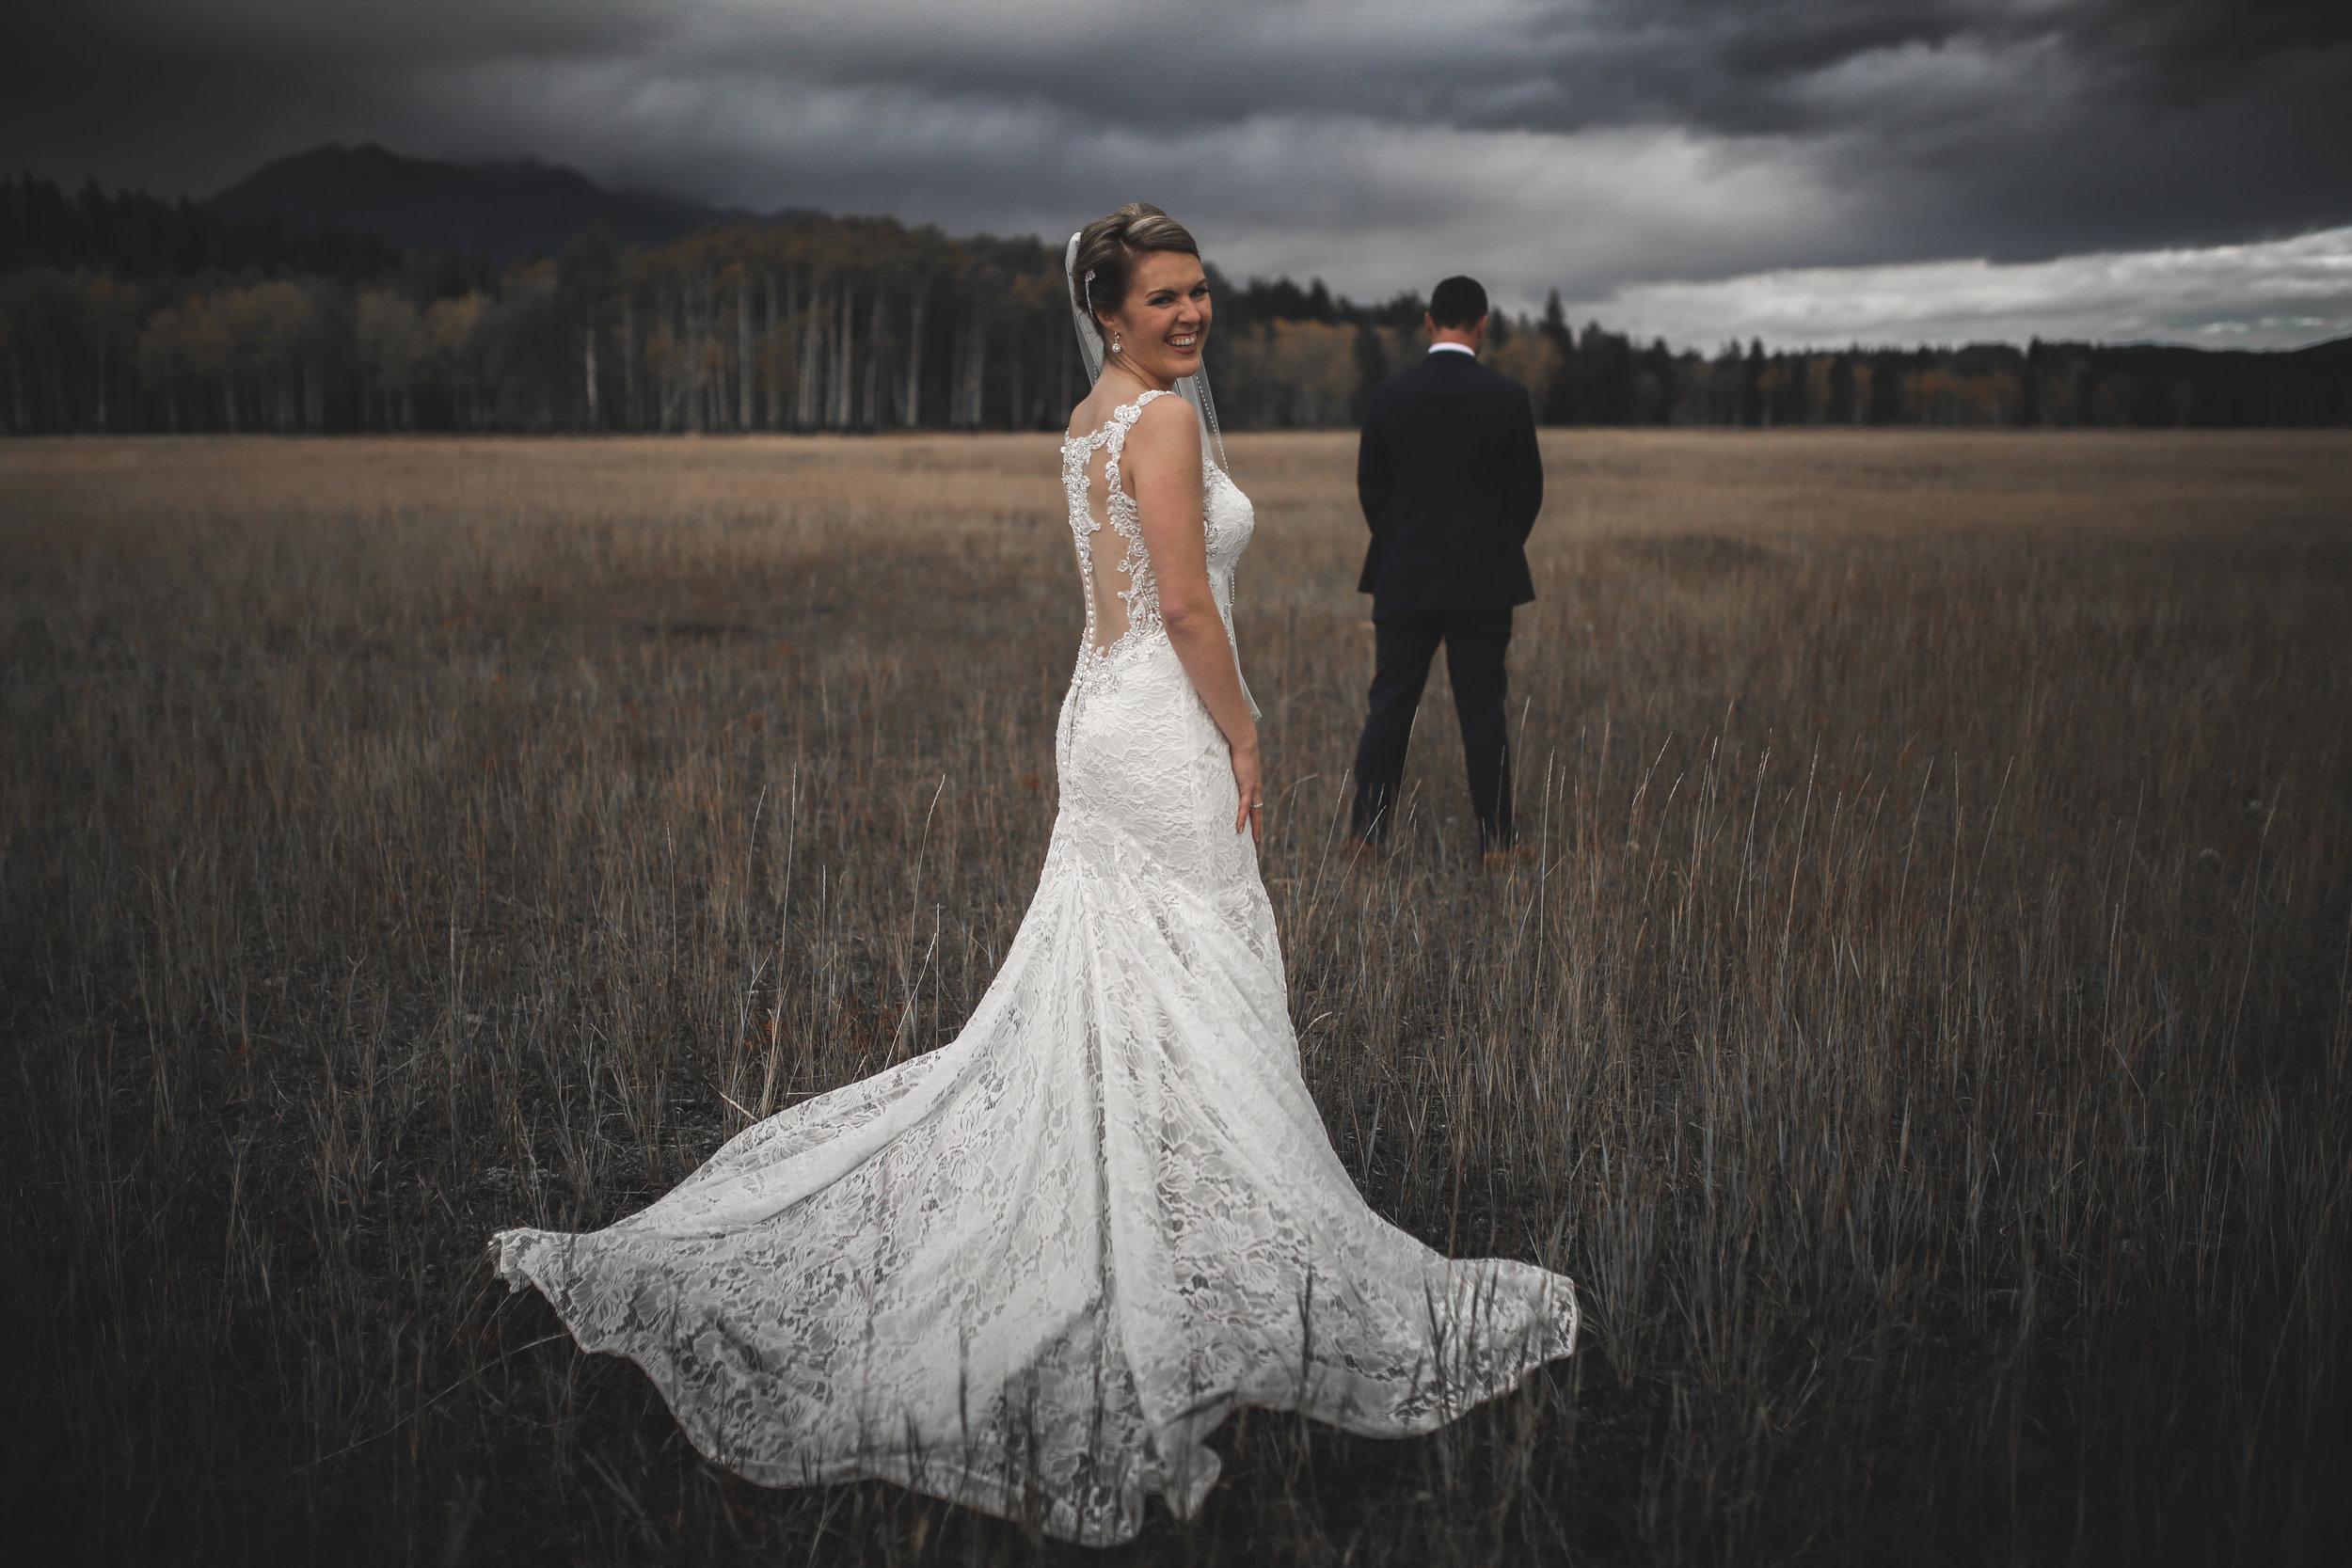 46 Adam Ziorio Photography - Vitoria wedding photographer Nick&Bree Fernie Wedding.jpg